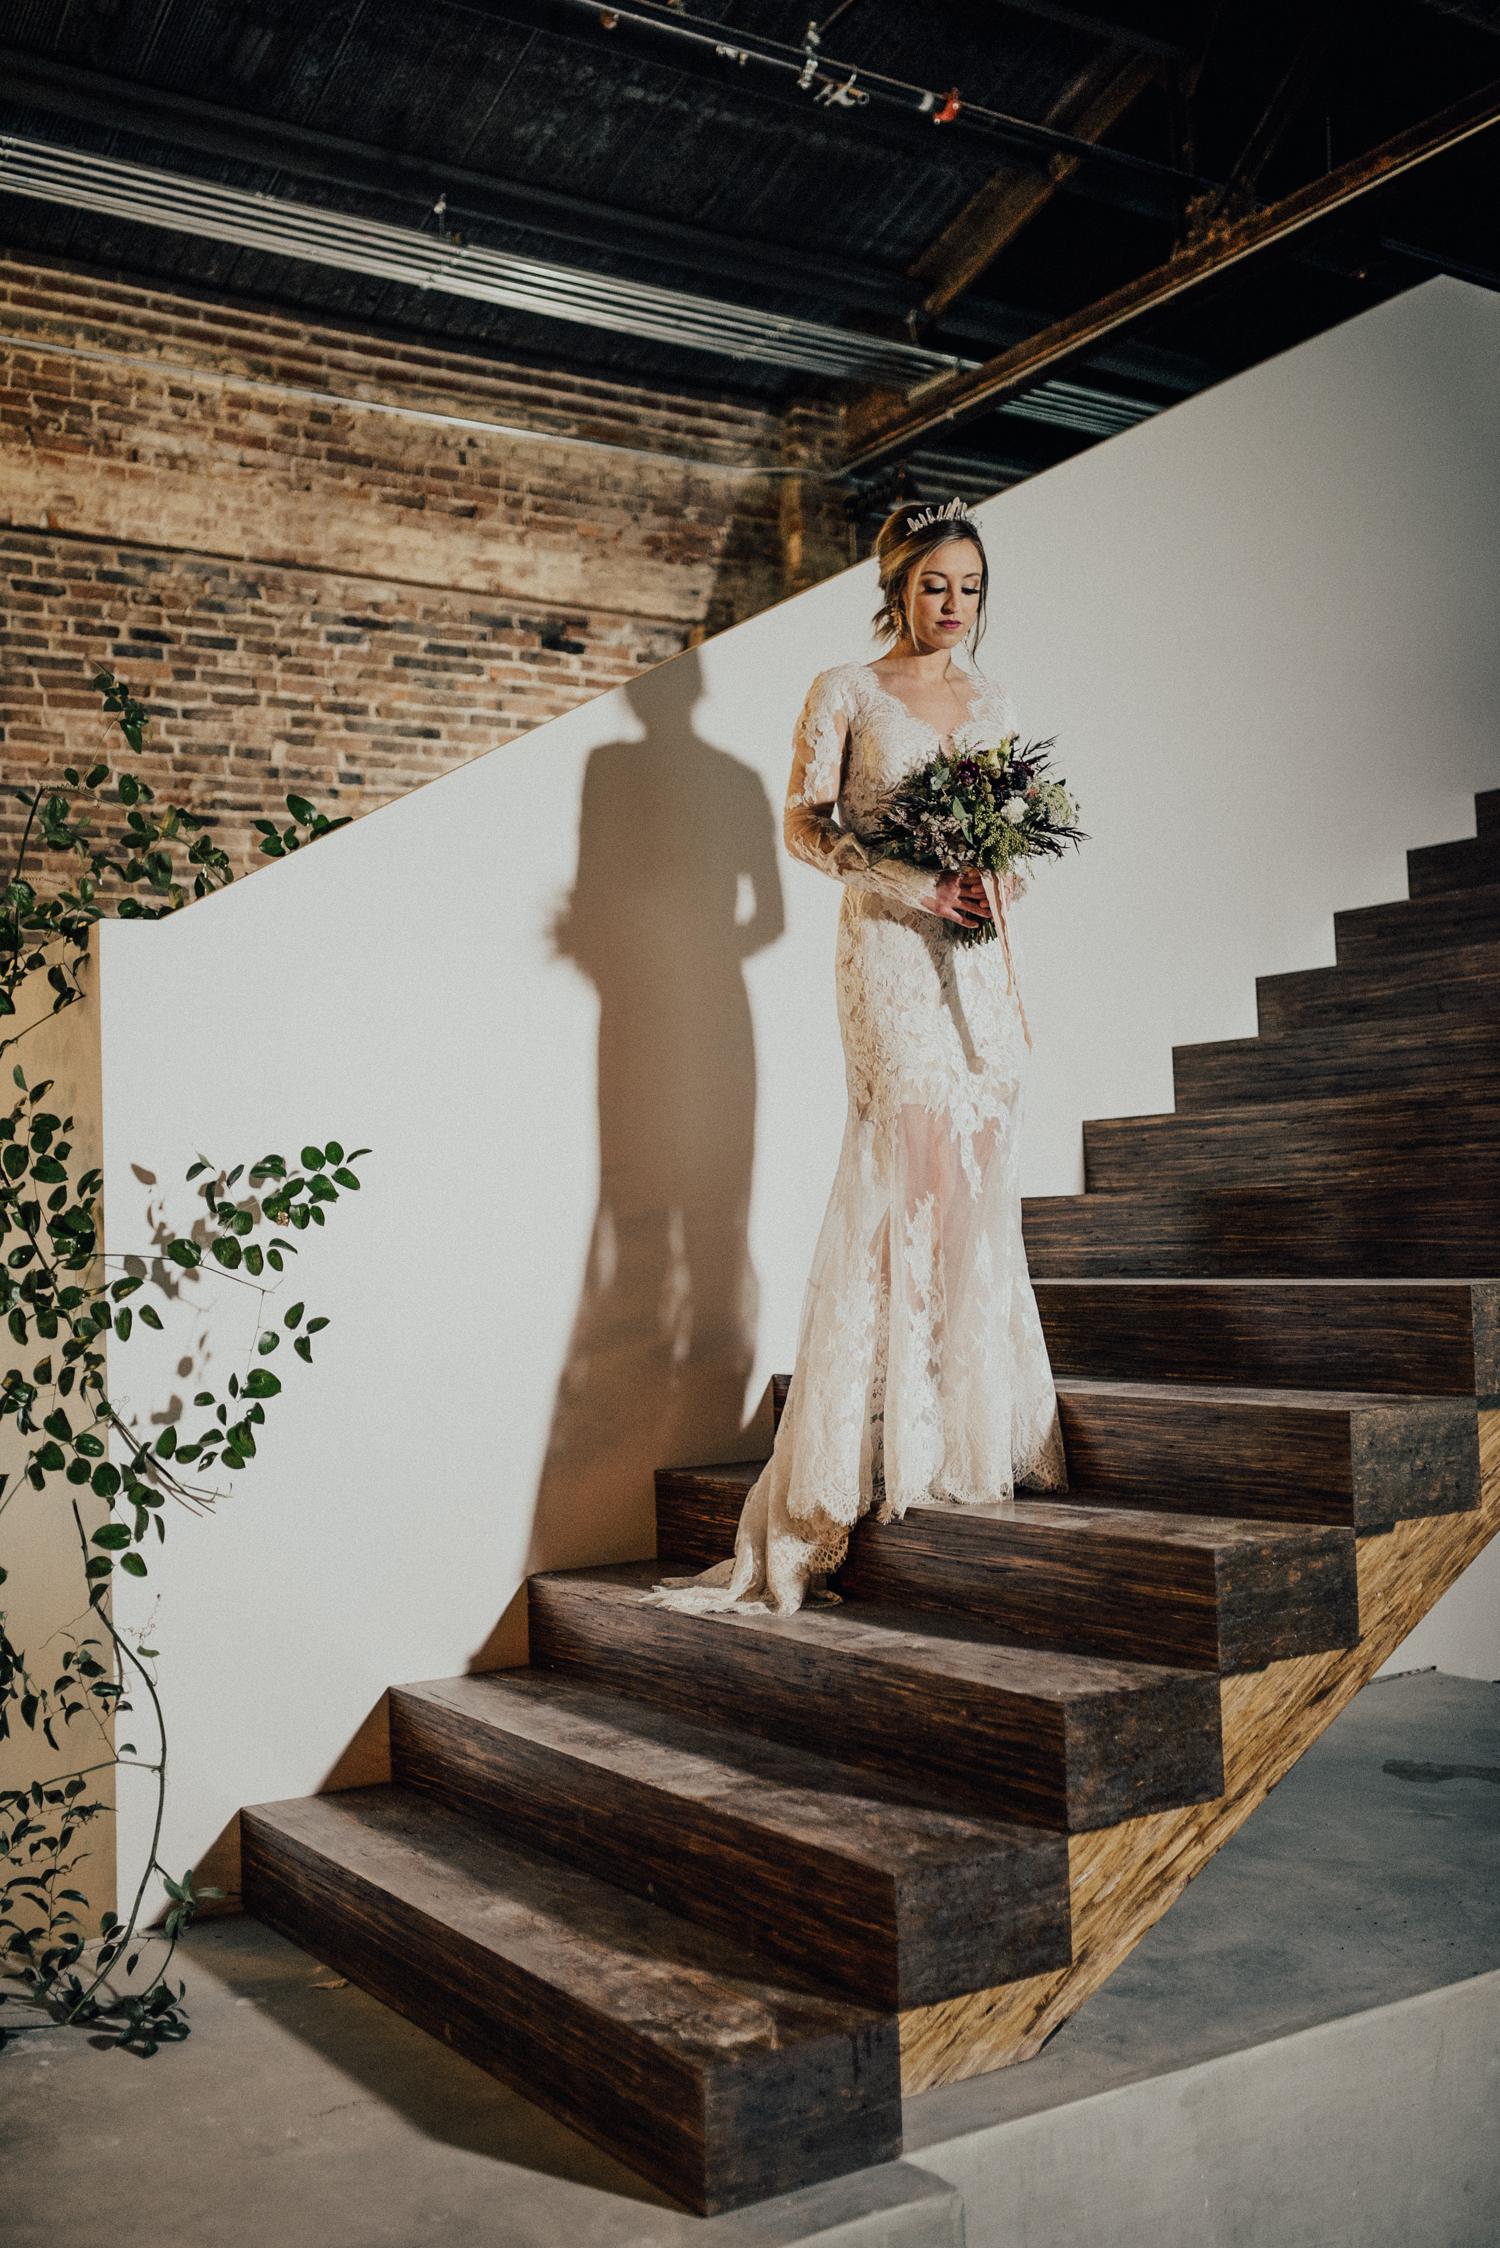 St-Louis-wedding-photographers-99.jpg